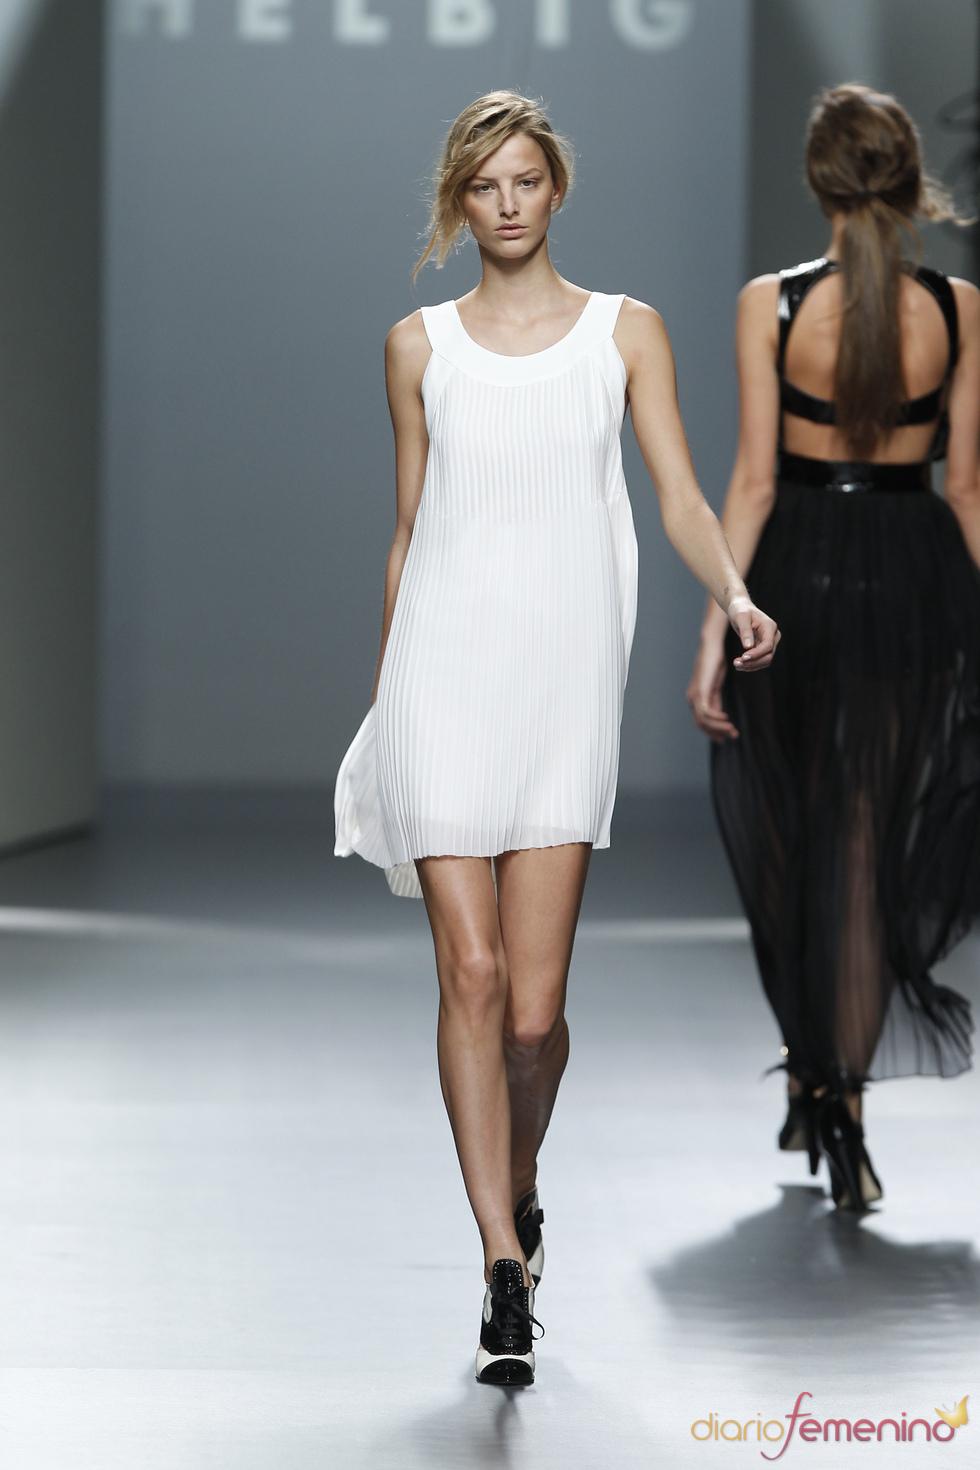 Vestido Blanco plisado.Teresa Helbig O/I 2011-12. Cibeles Madrid Fashion Week